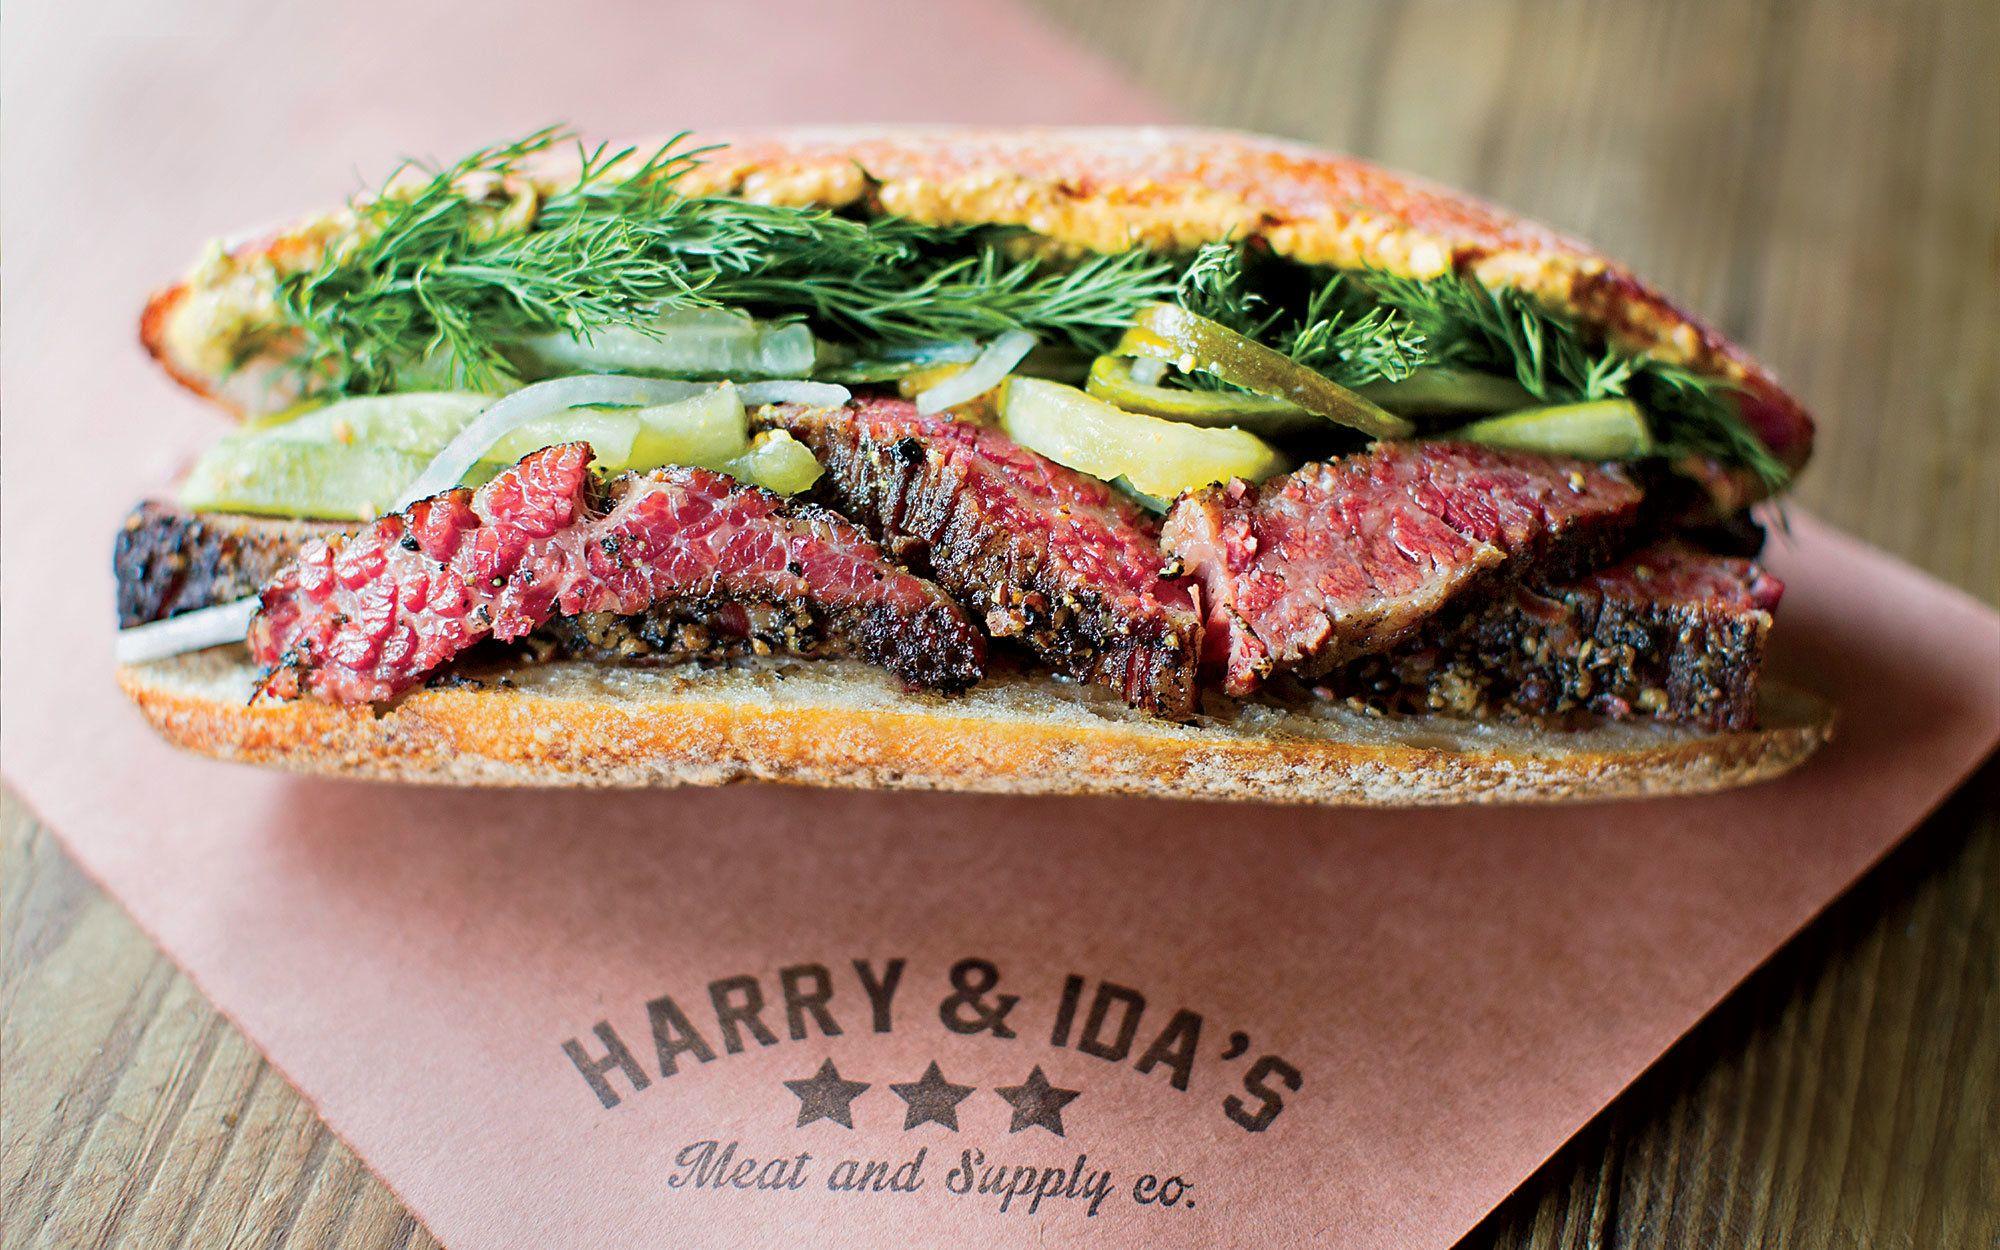 Pop's Pastrami: Harry & Ida's Meat & Supply Co., New York City